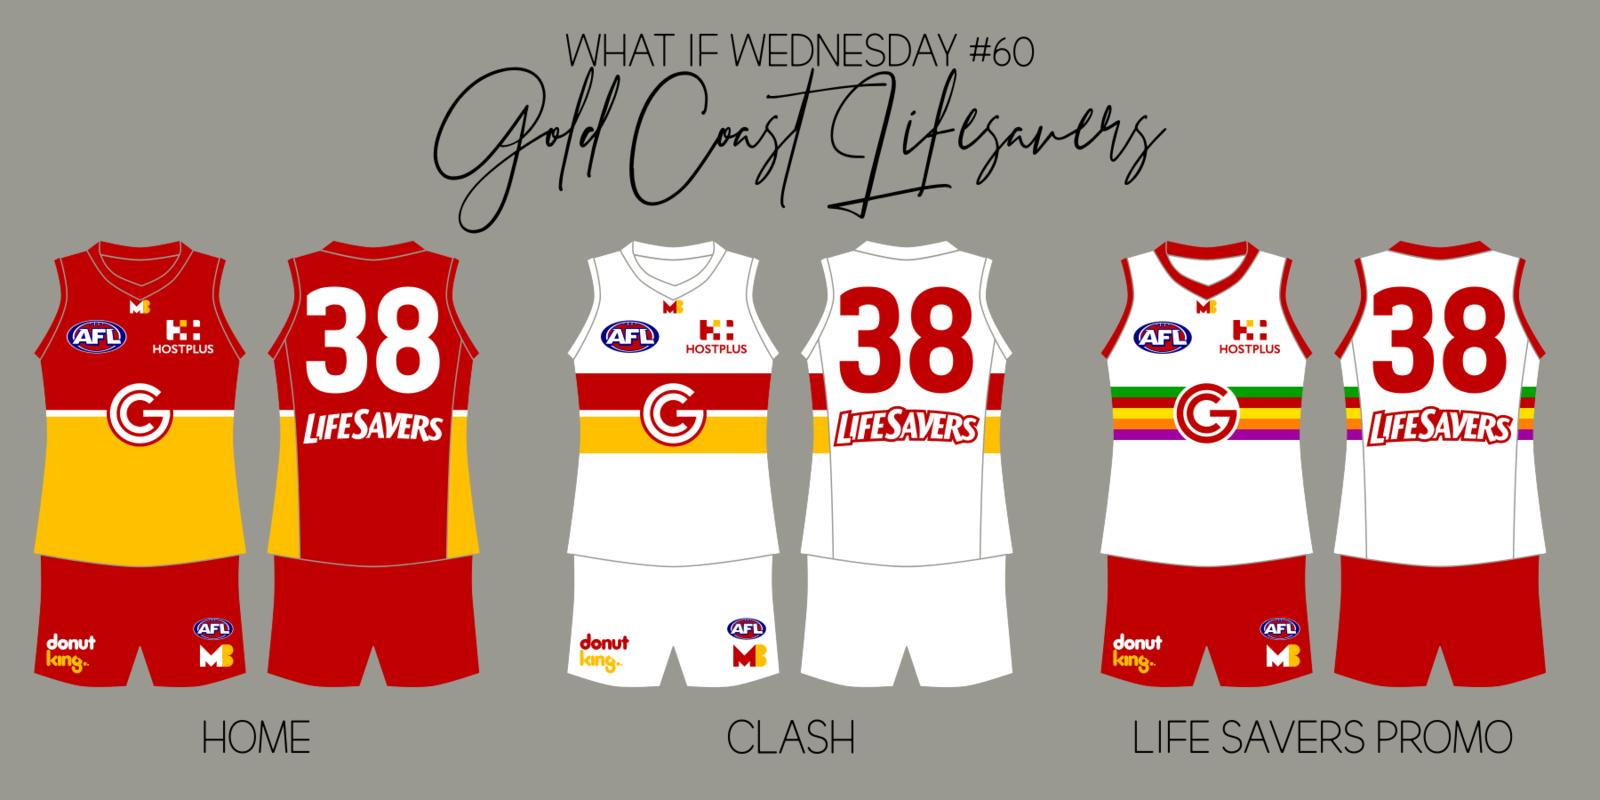 60 Gold Coast Lifesavers.png